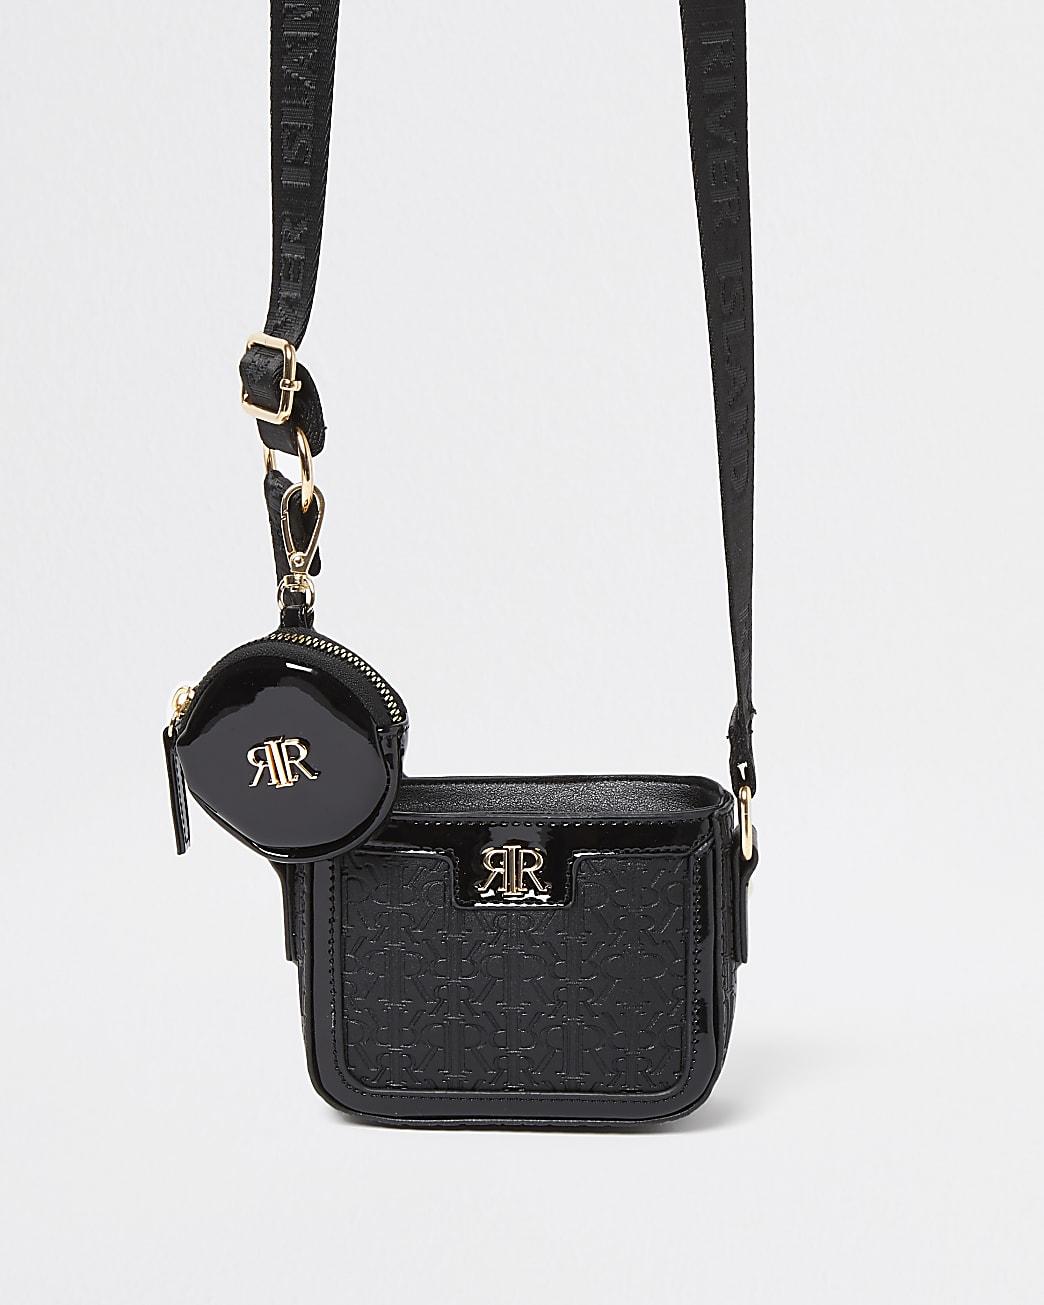 Girls black RR monogram crossbody & purse